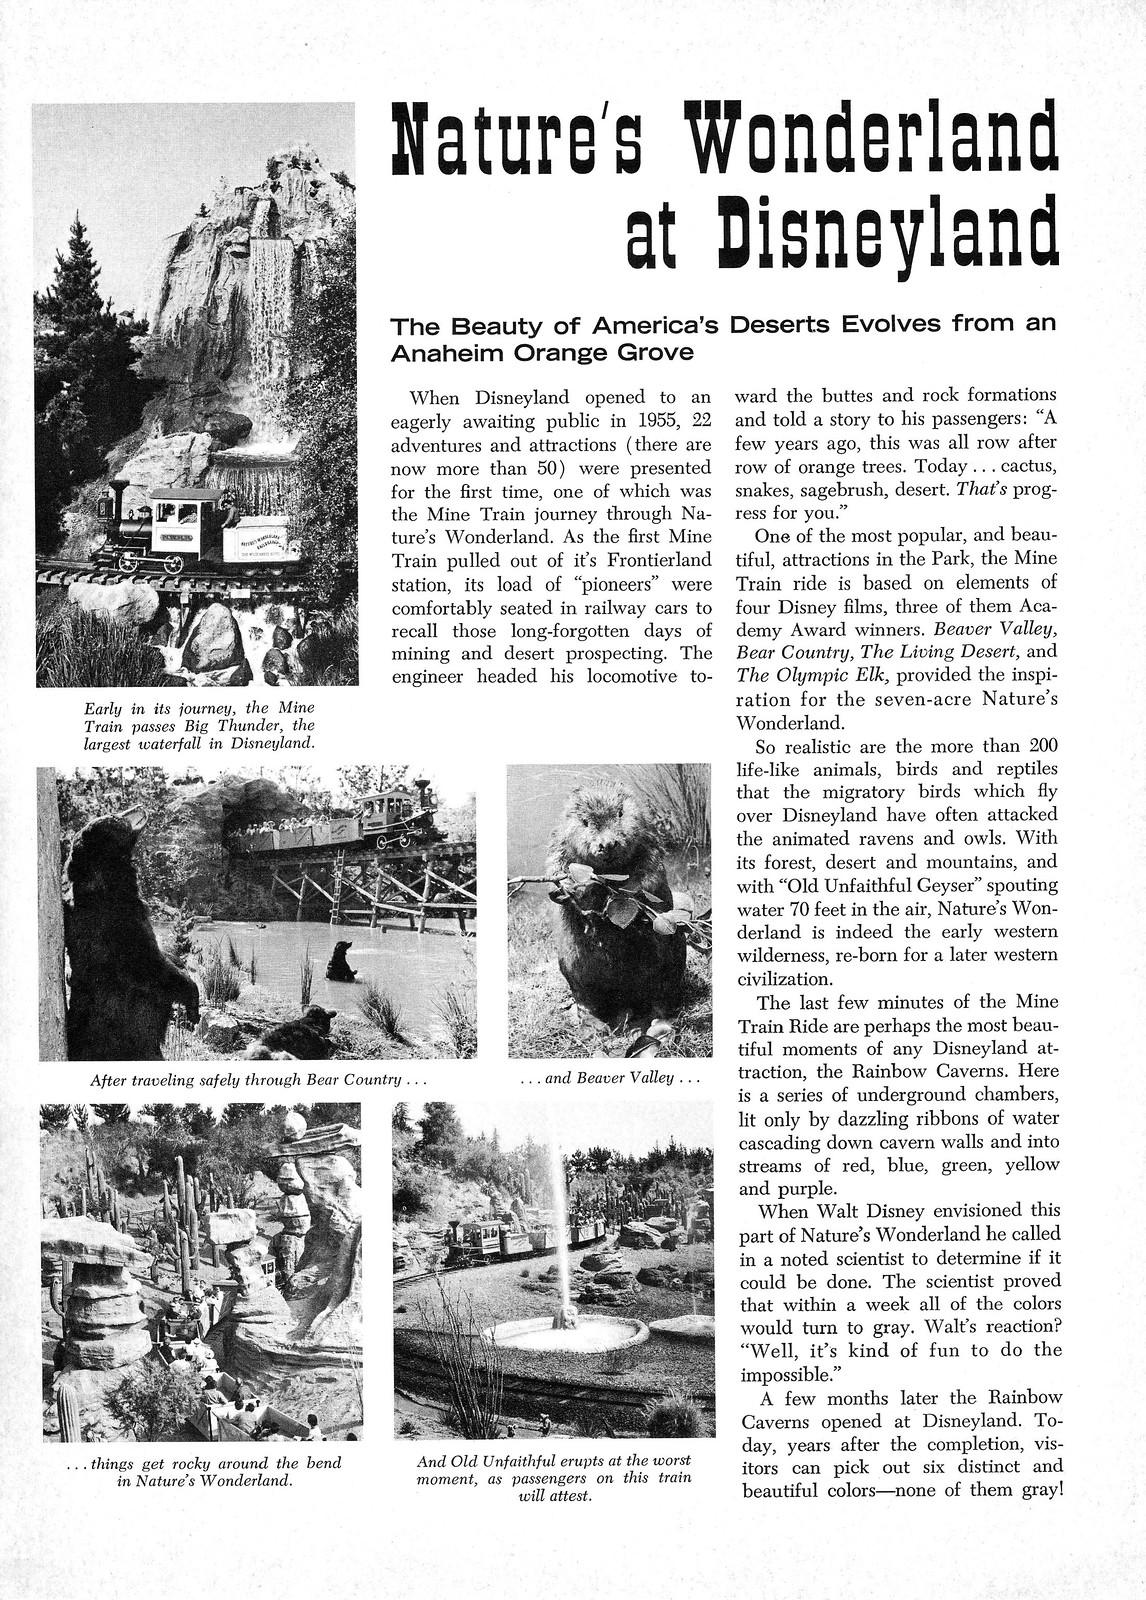 Disneyland Vacationland Fall 1967 09 - Nature's Wonderland